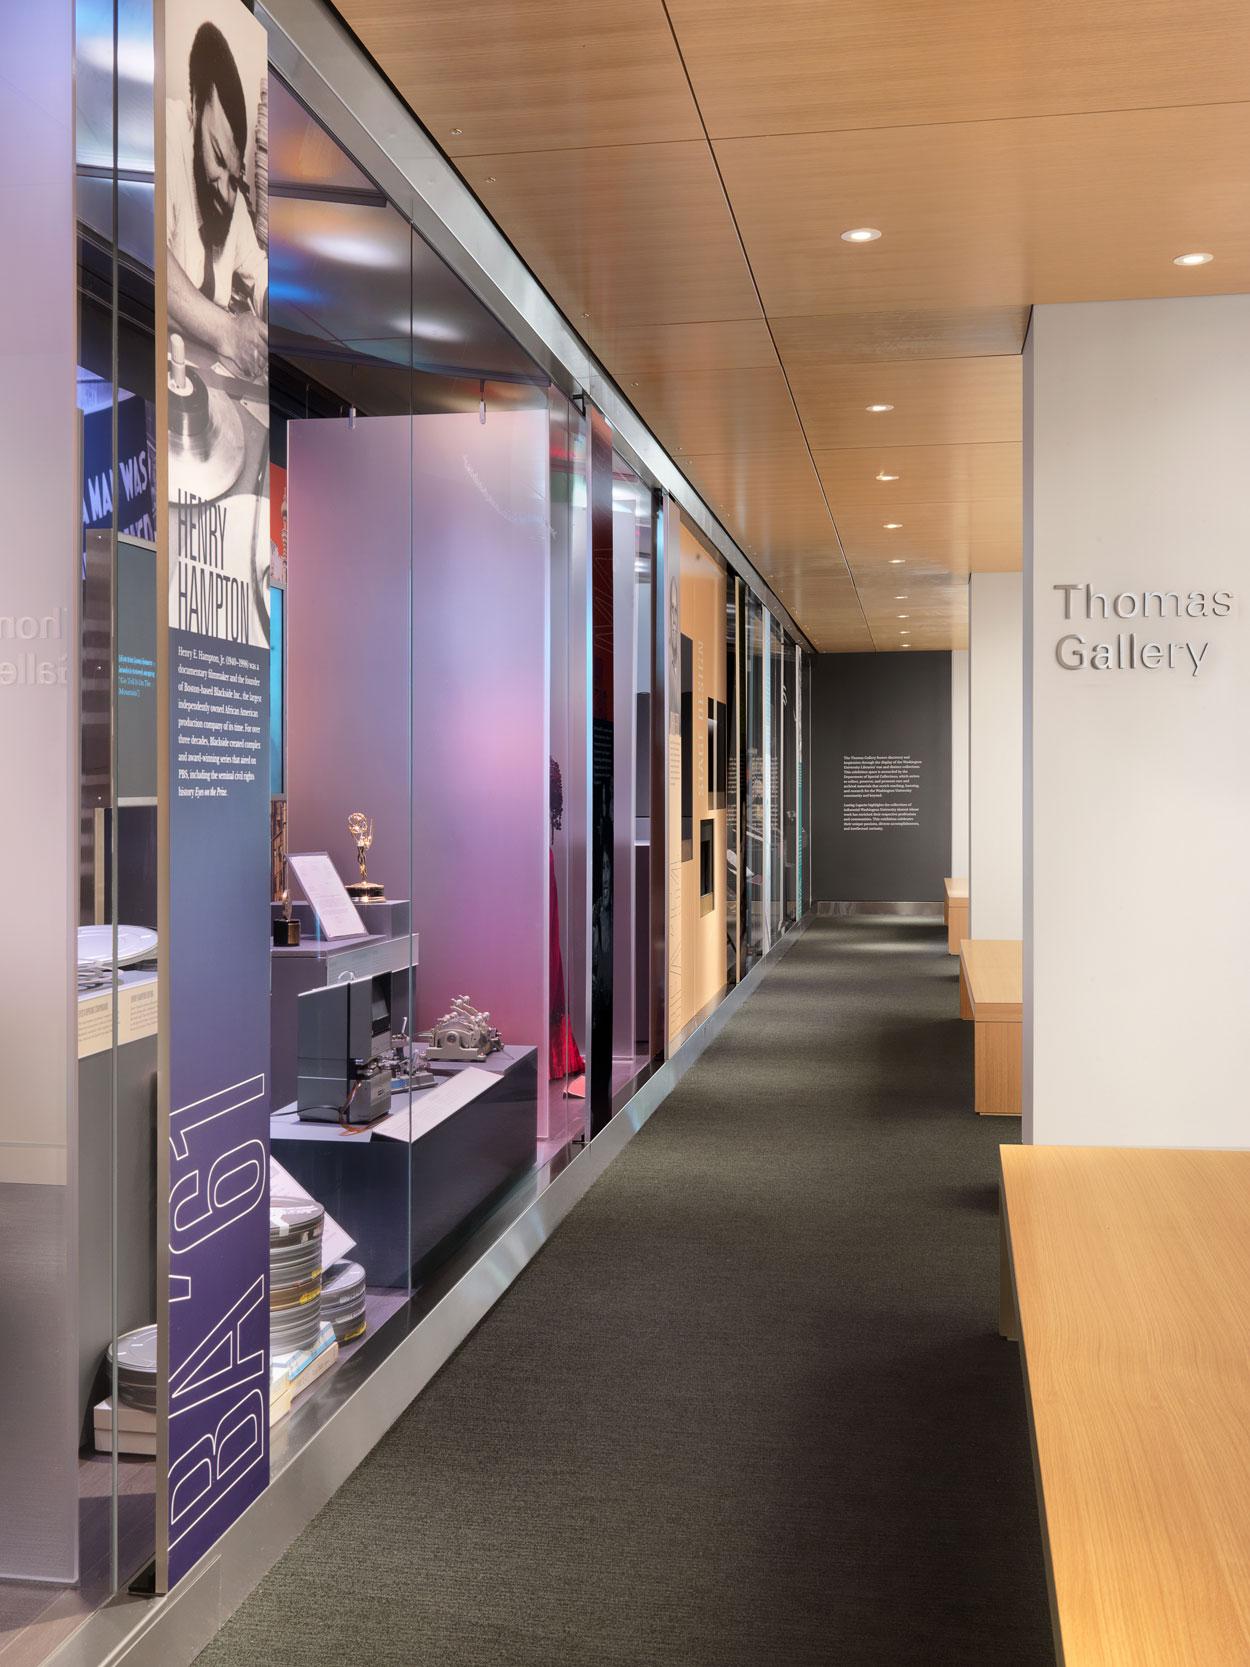 Exhibit Design for University Library